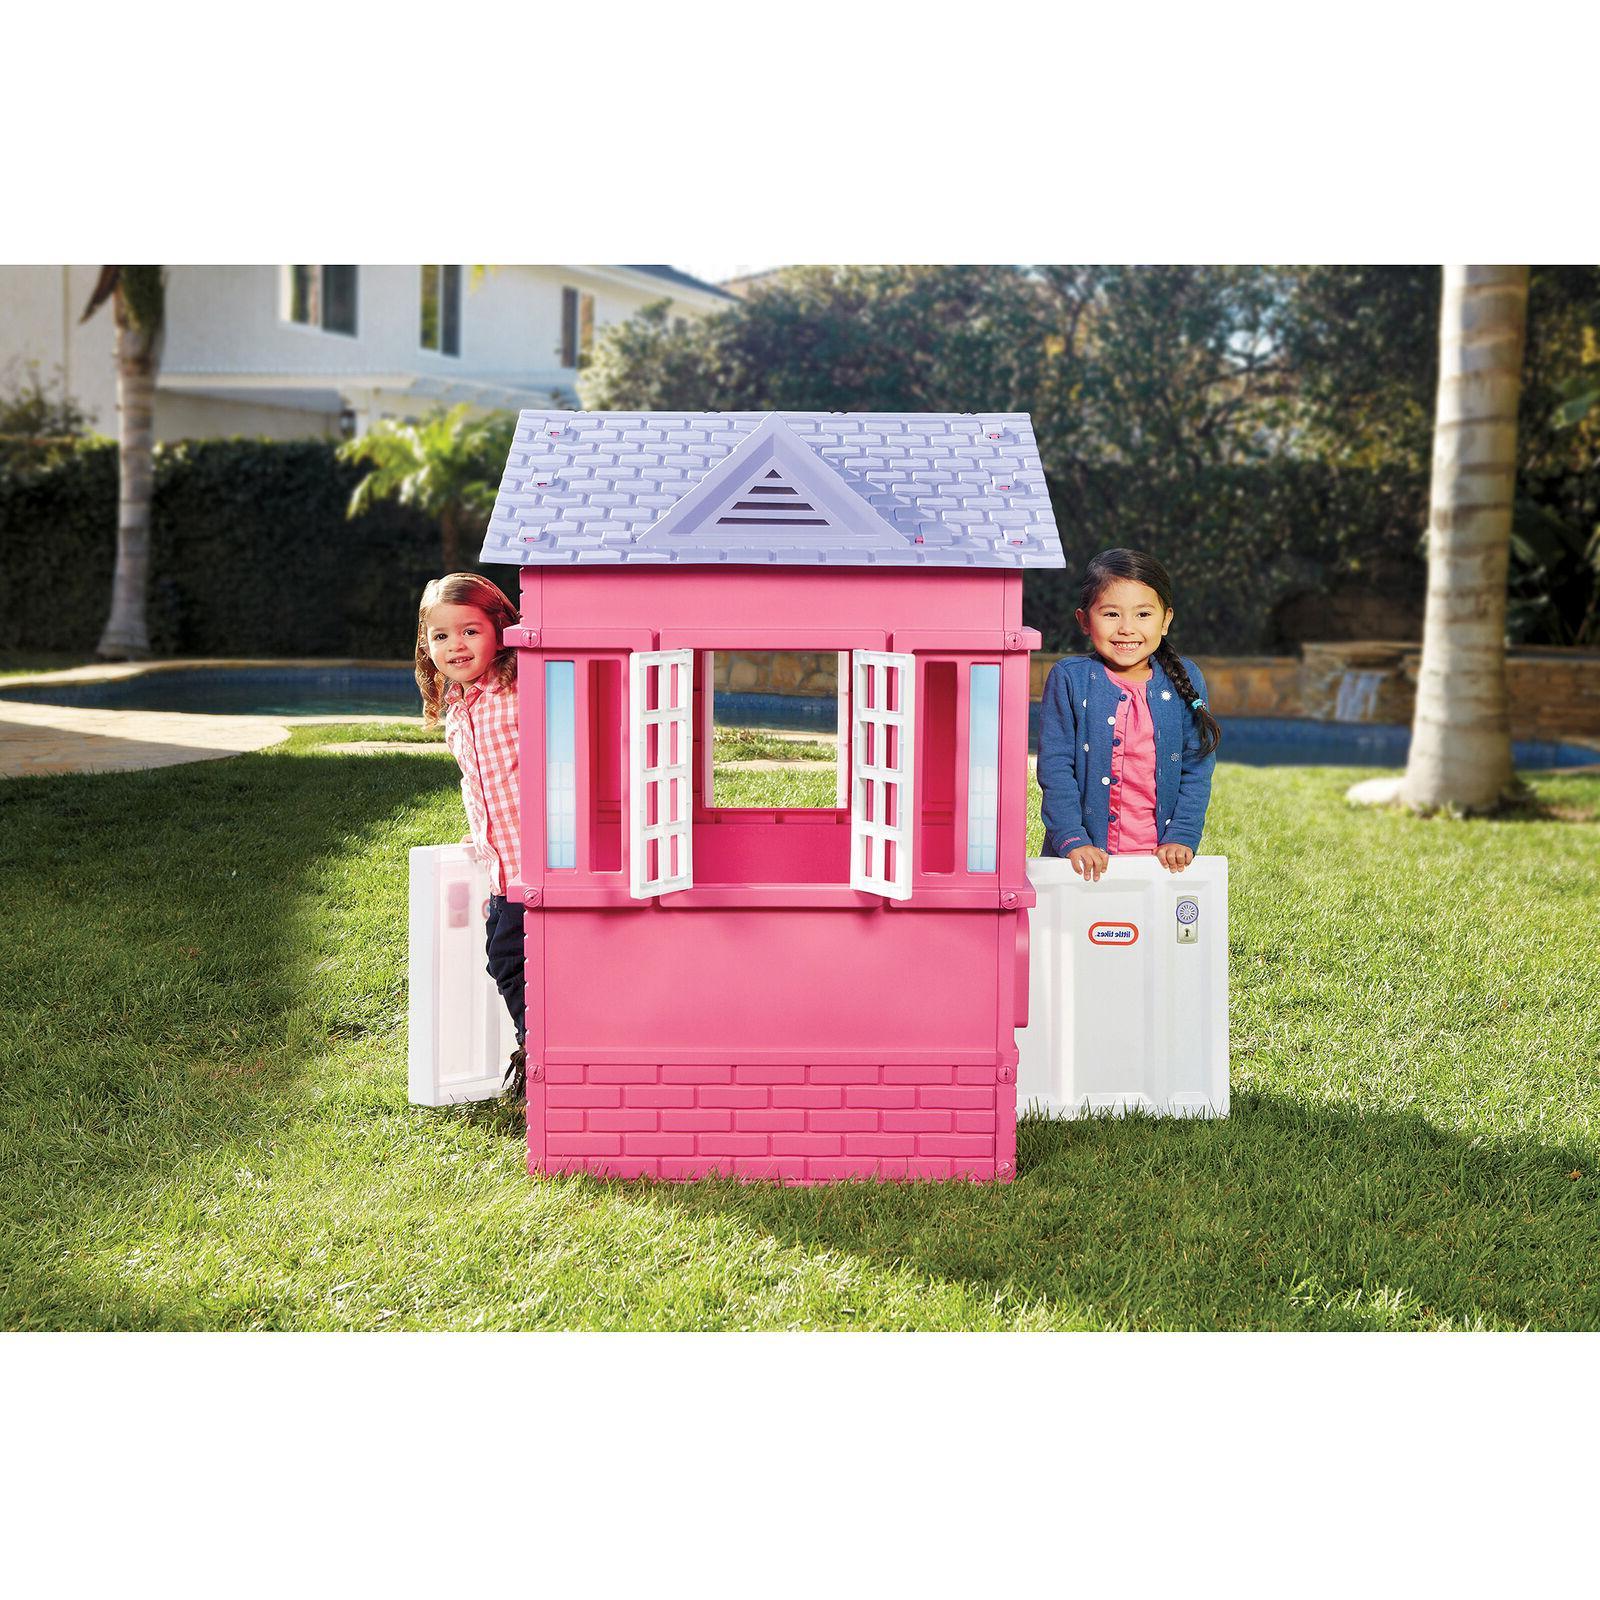 Princess Playhouse Portable Cottage Sturdy Kids Toddler Ligh